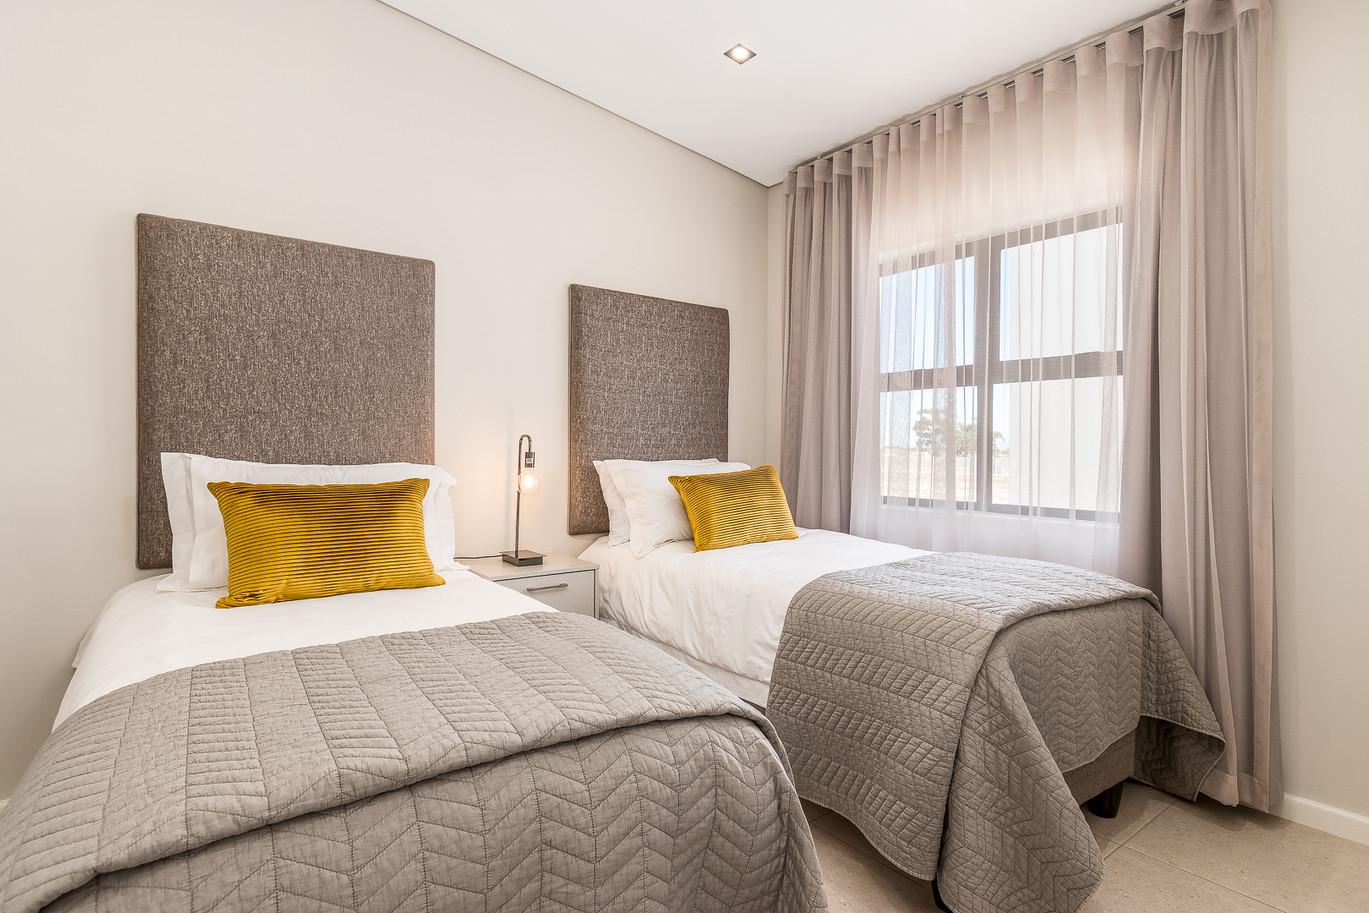 Greystone Bedroom 4